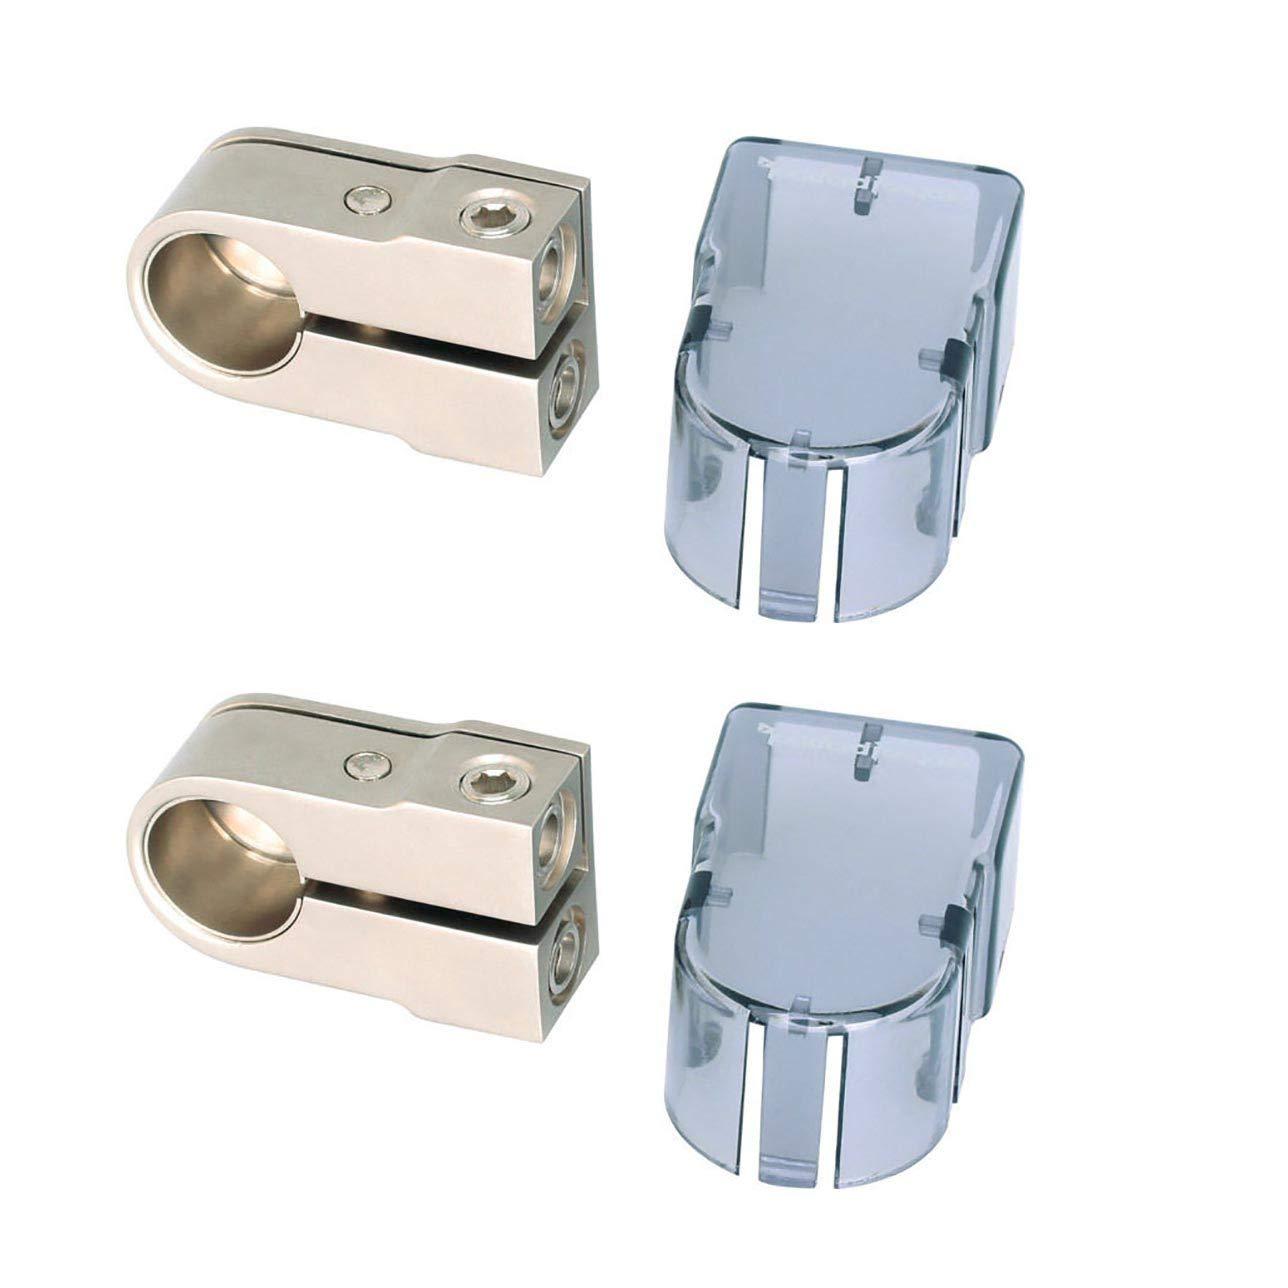 Rockford Fosgate 4 AWG Positive/Negative Car Amplifier Battery Terminal (2 Pack)